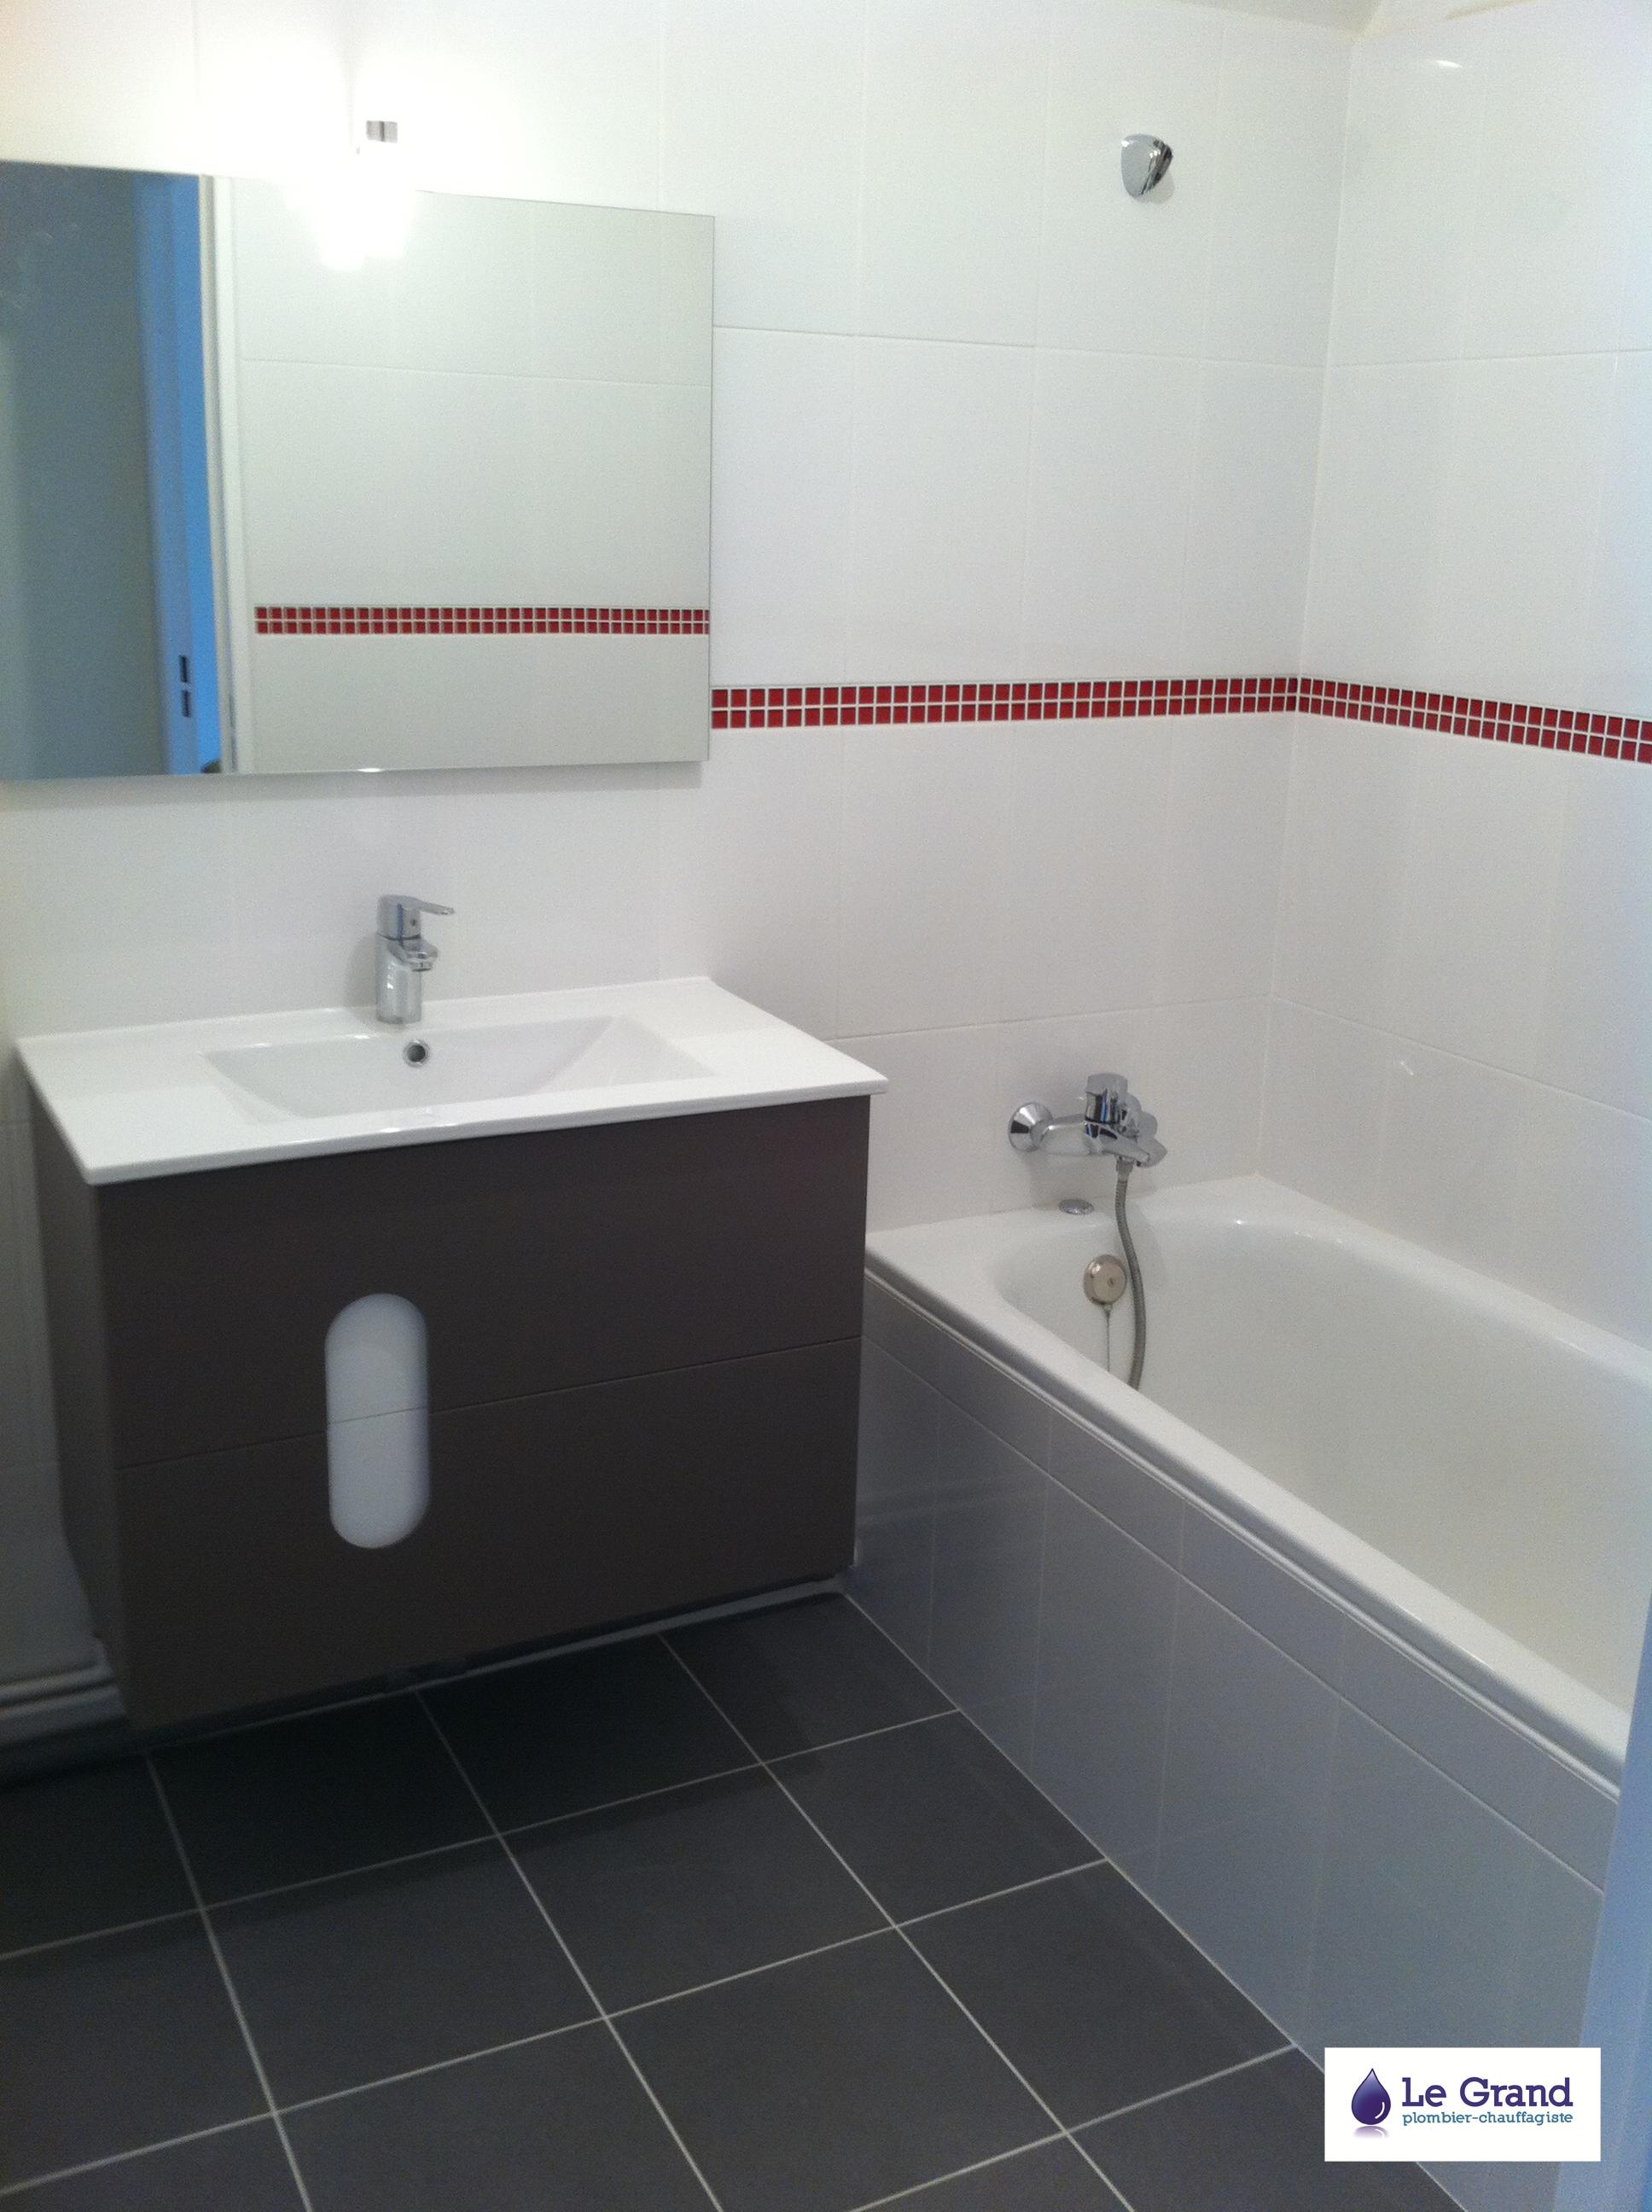 mosaique rouge salle de bain perfect mosaque travertin. Black Bedroom Furniture Sets. Home Design Ideas